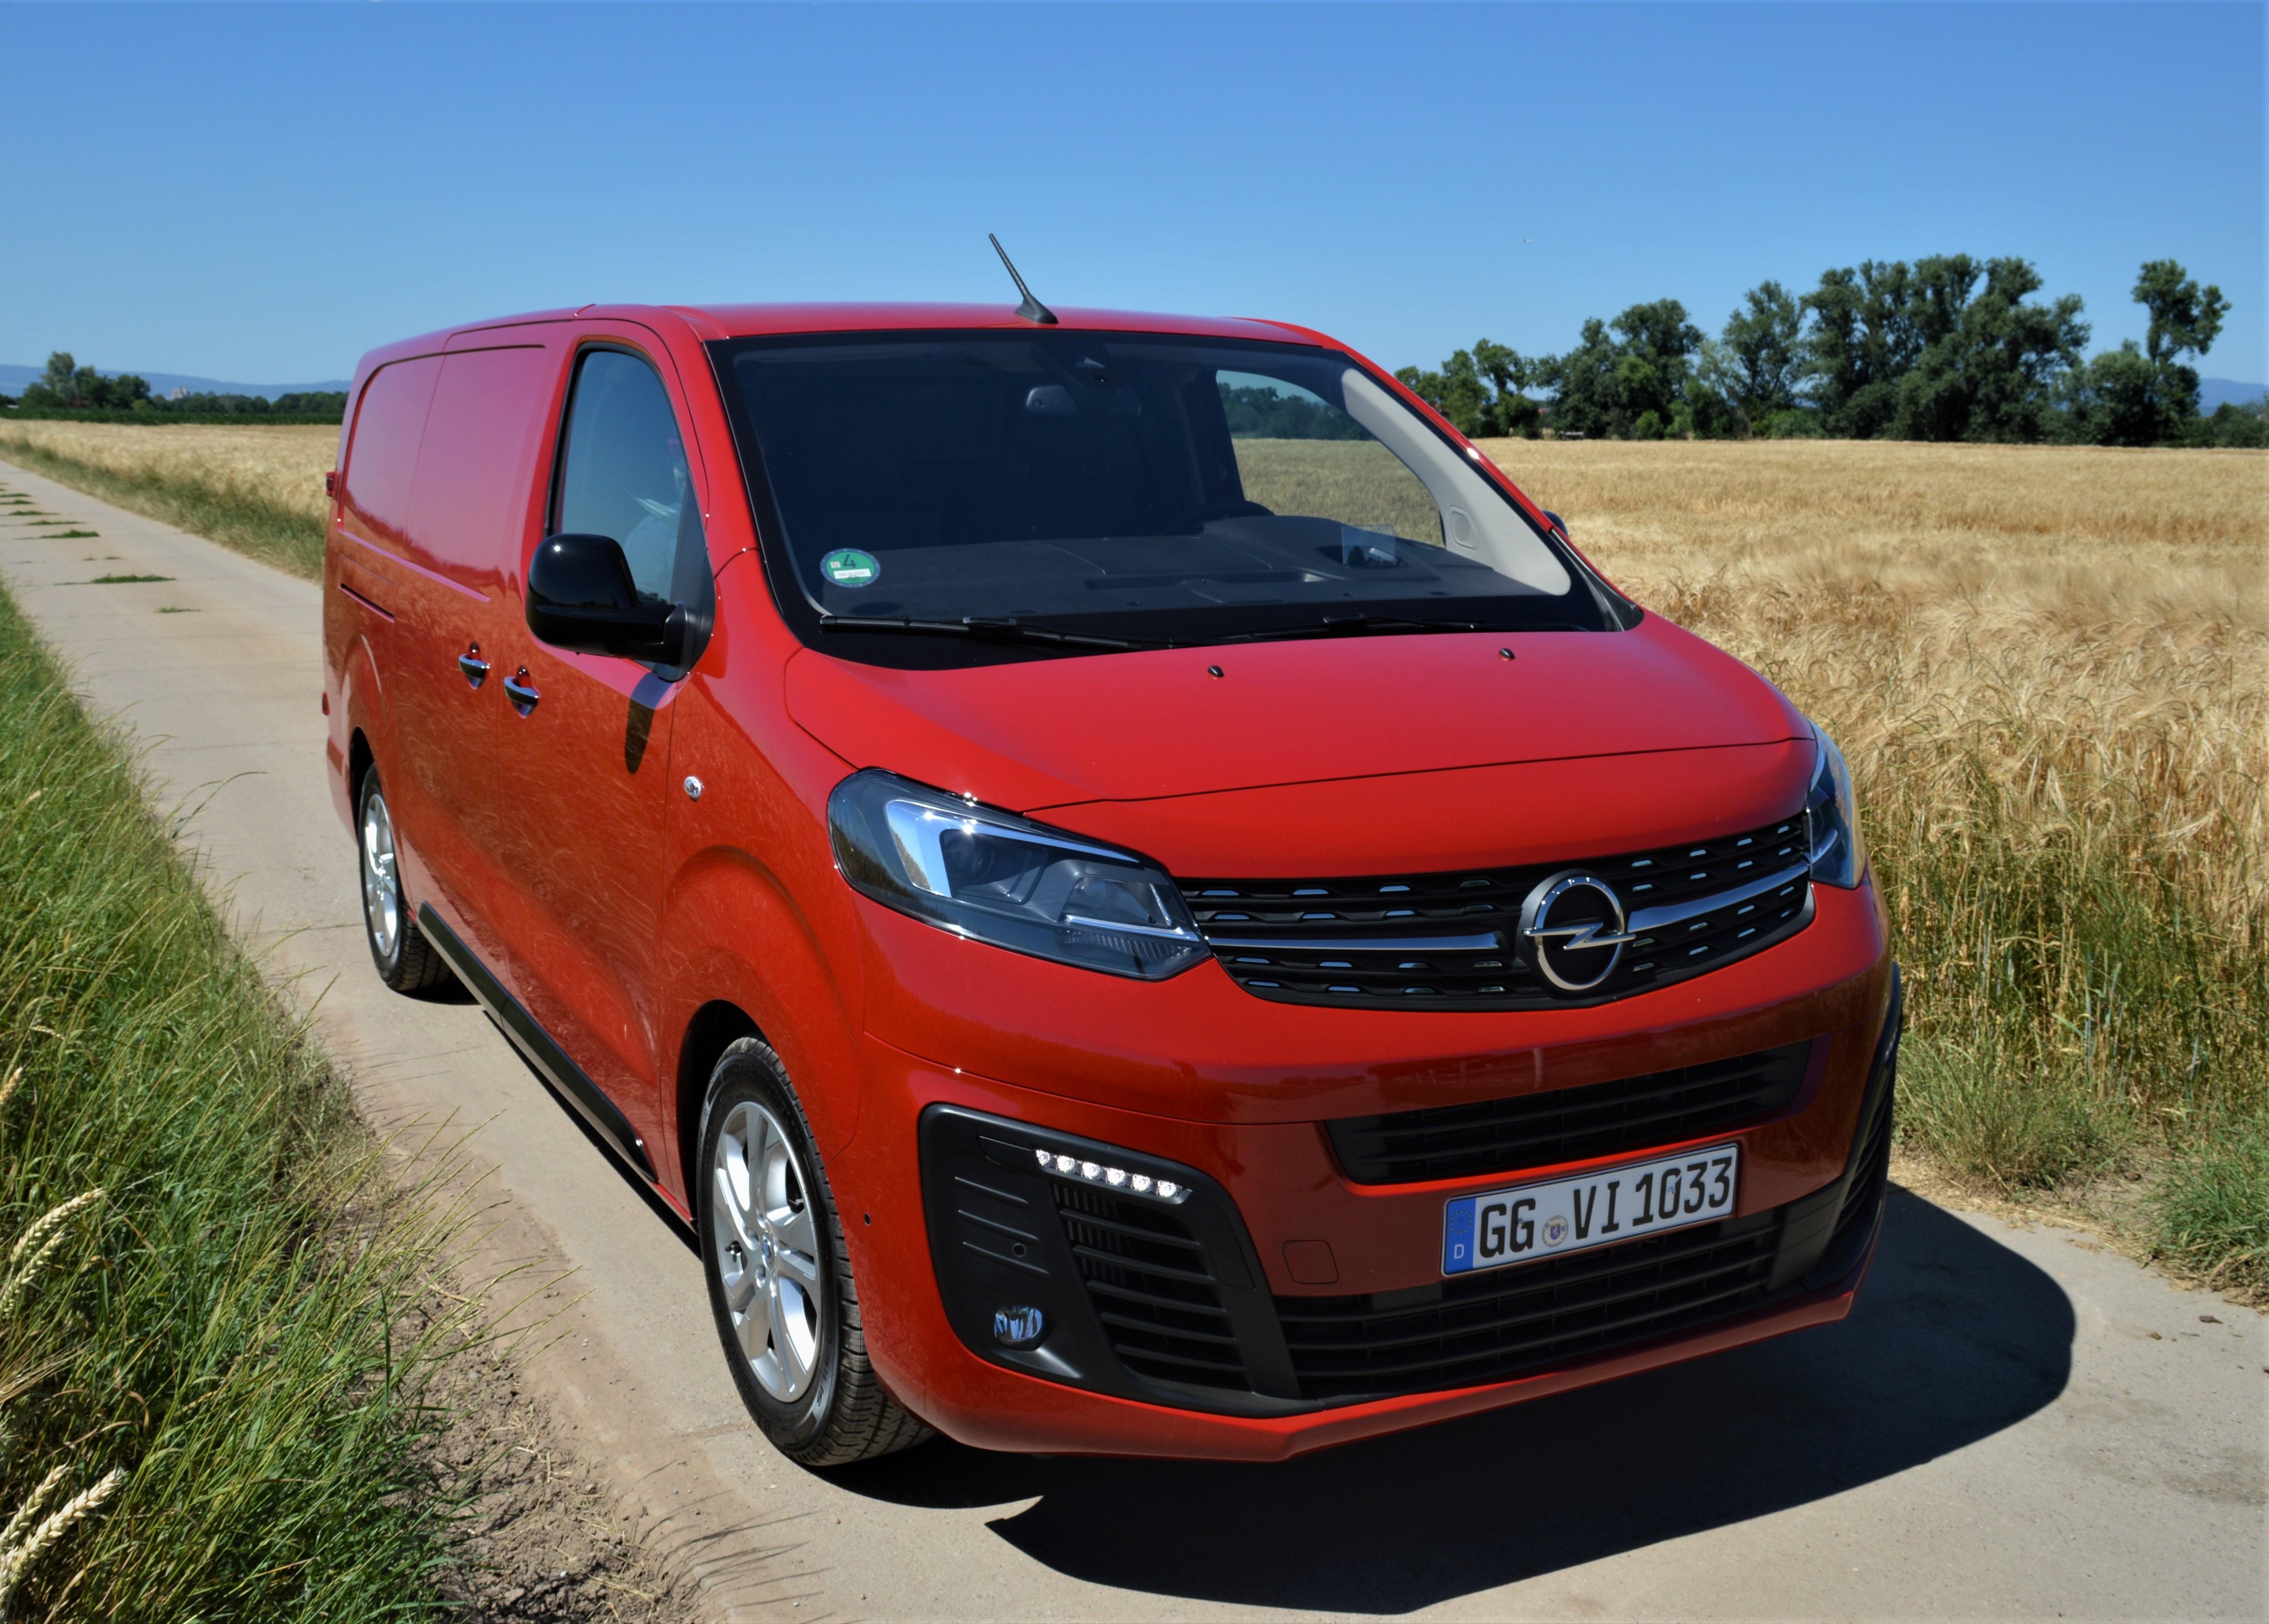 Essai - Opel Vivaro (2019) : une valeur sûre